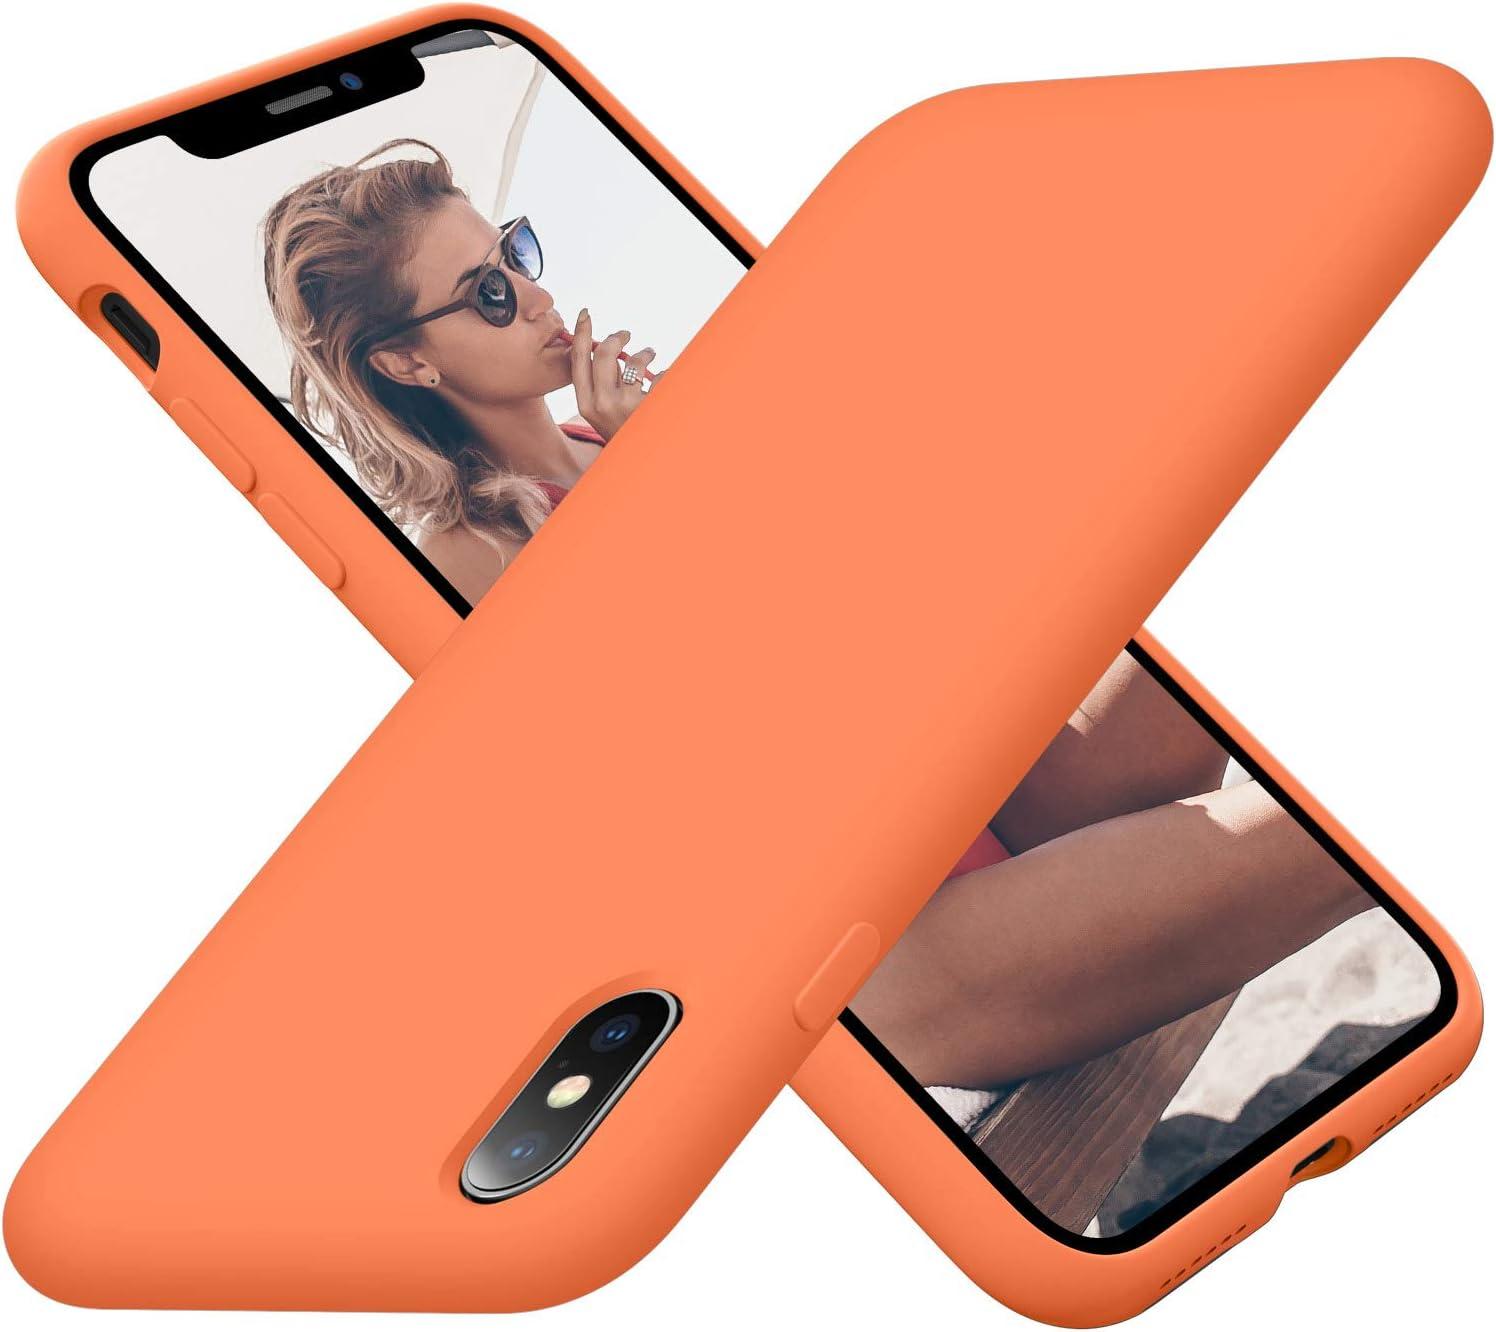 Cordking Phone Case iPhone X, iPhone Xs Case, Silicone Ultra Slim Shockproof Phone Case with [Soft Anti-Scratch Microfiber Lining], 5.8 inch, Kumquat